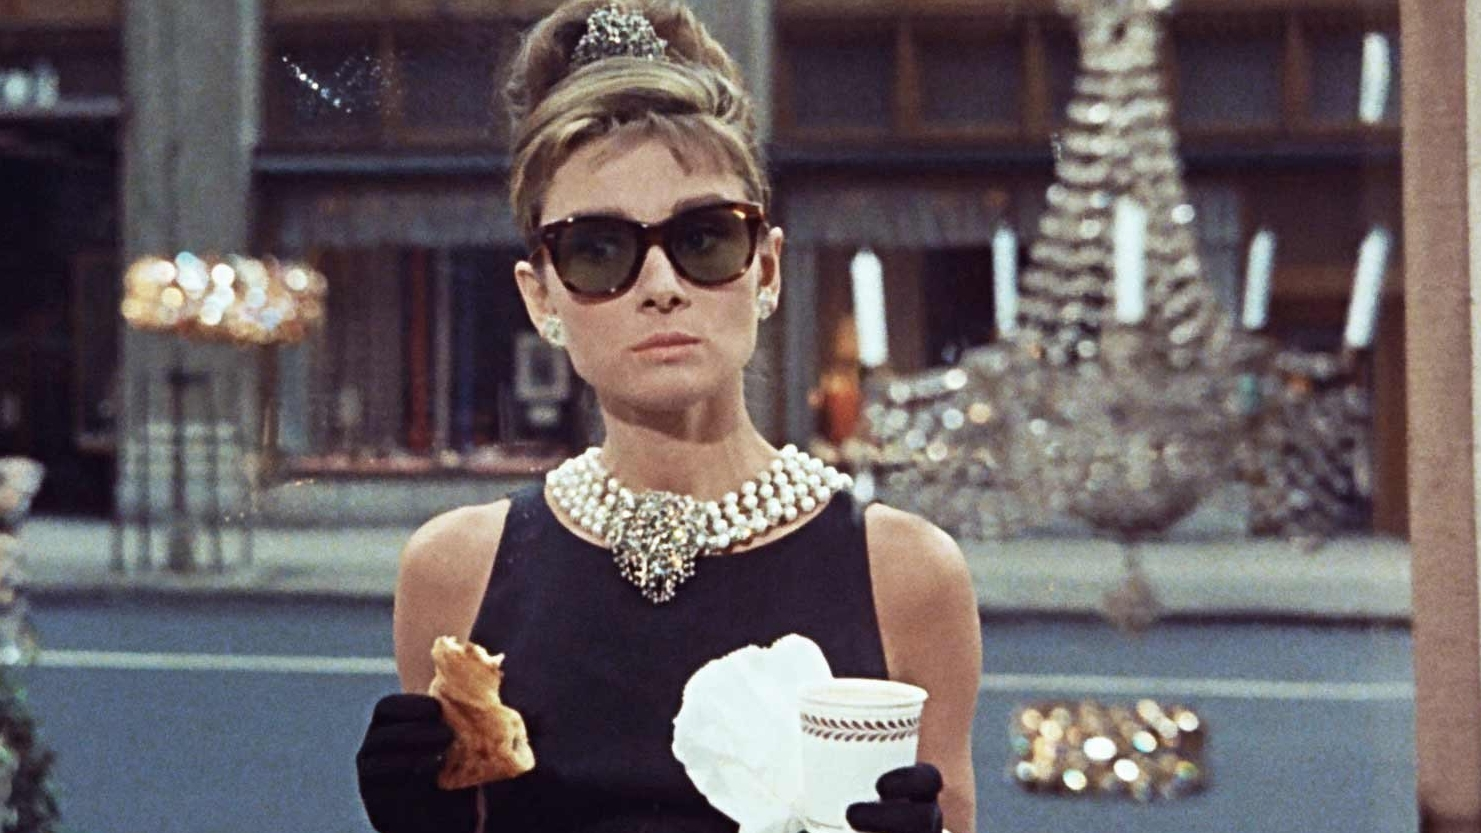 #61)Breakfast at Tiffany's - (1961 - dir. Blake Edwards)